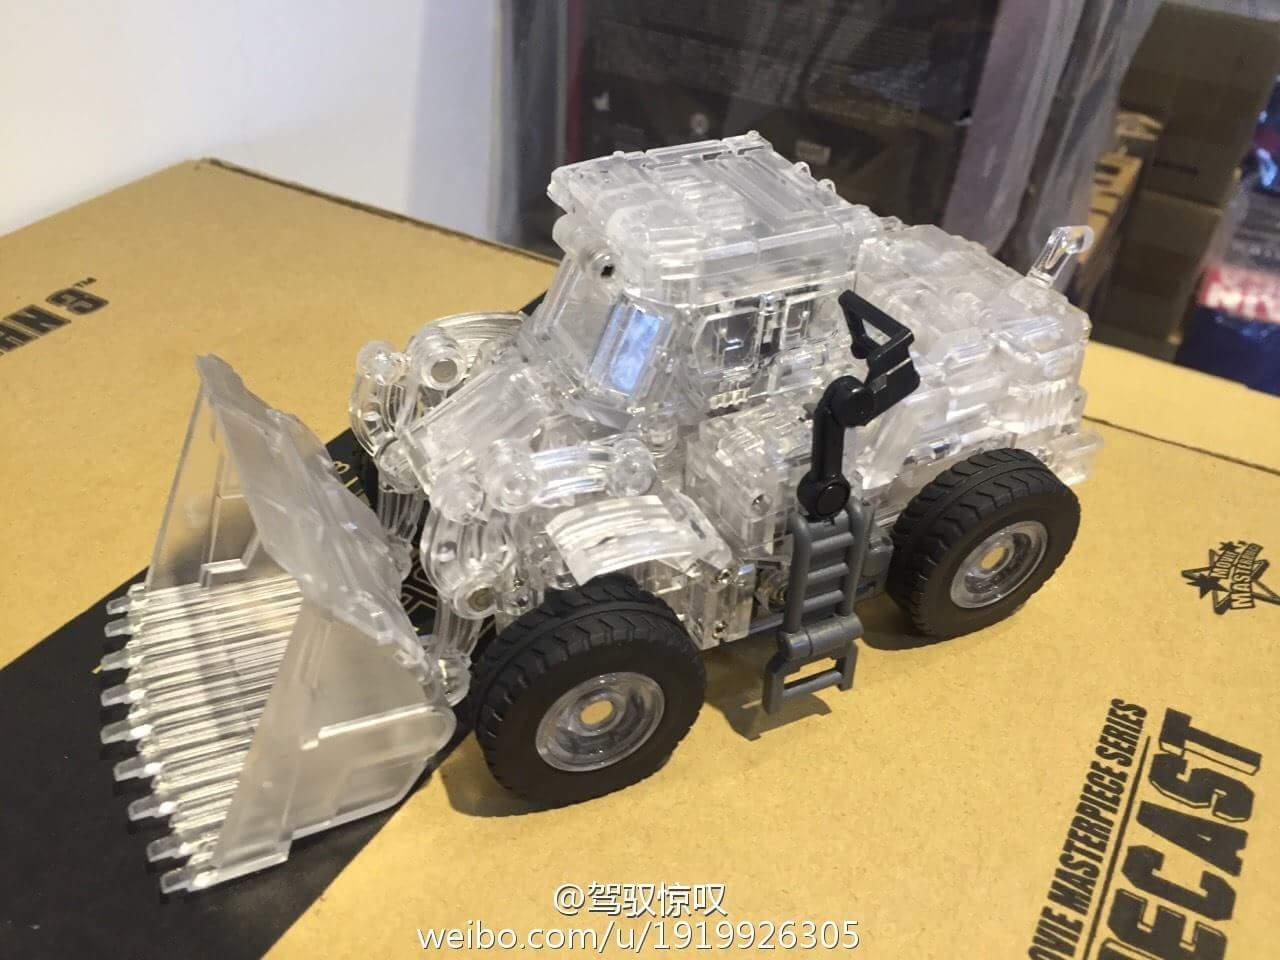 [Generation Toy] Produit Tiers - Jouet GT-01 Gravity Builder - aka Devastator/Dévastateur - Page 4 53di09rv